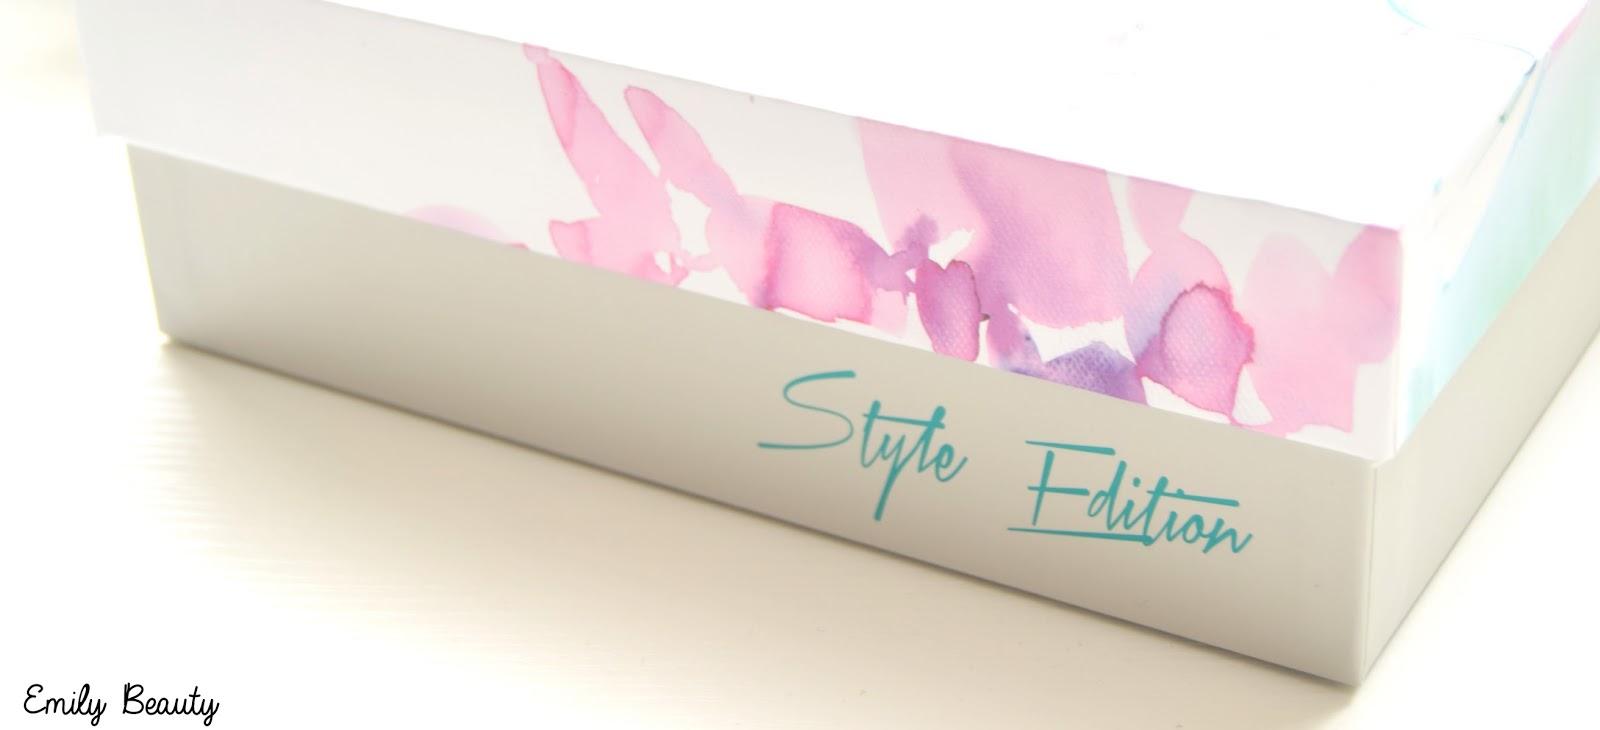 emily beauty  style edition de glossybox